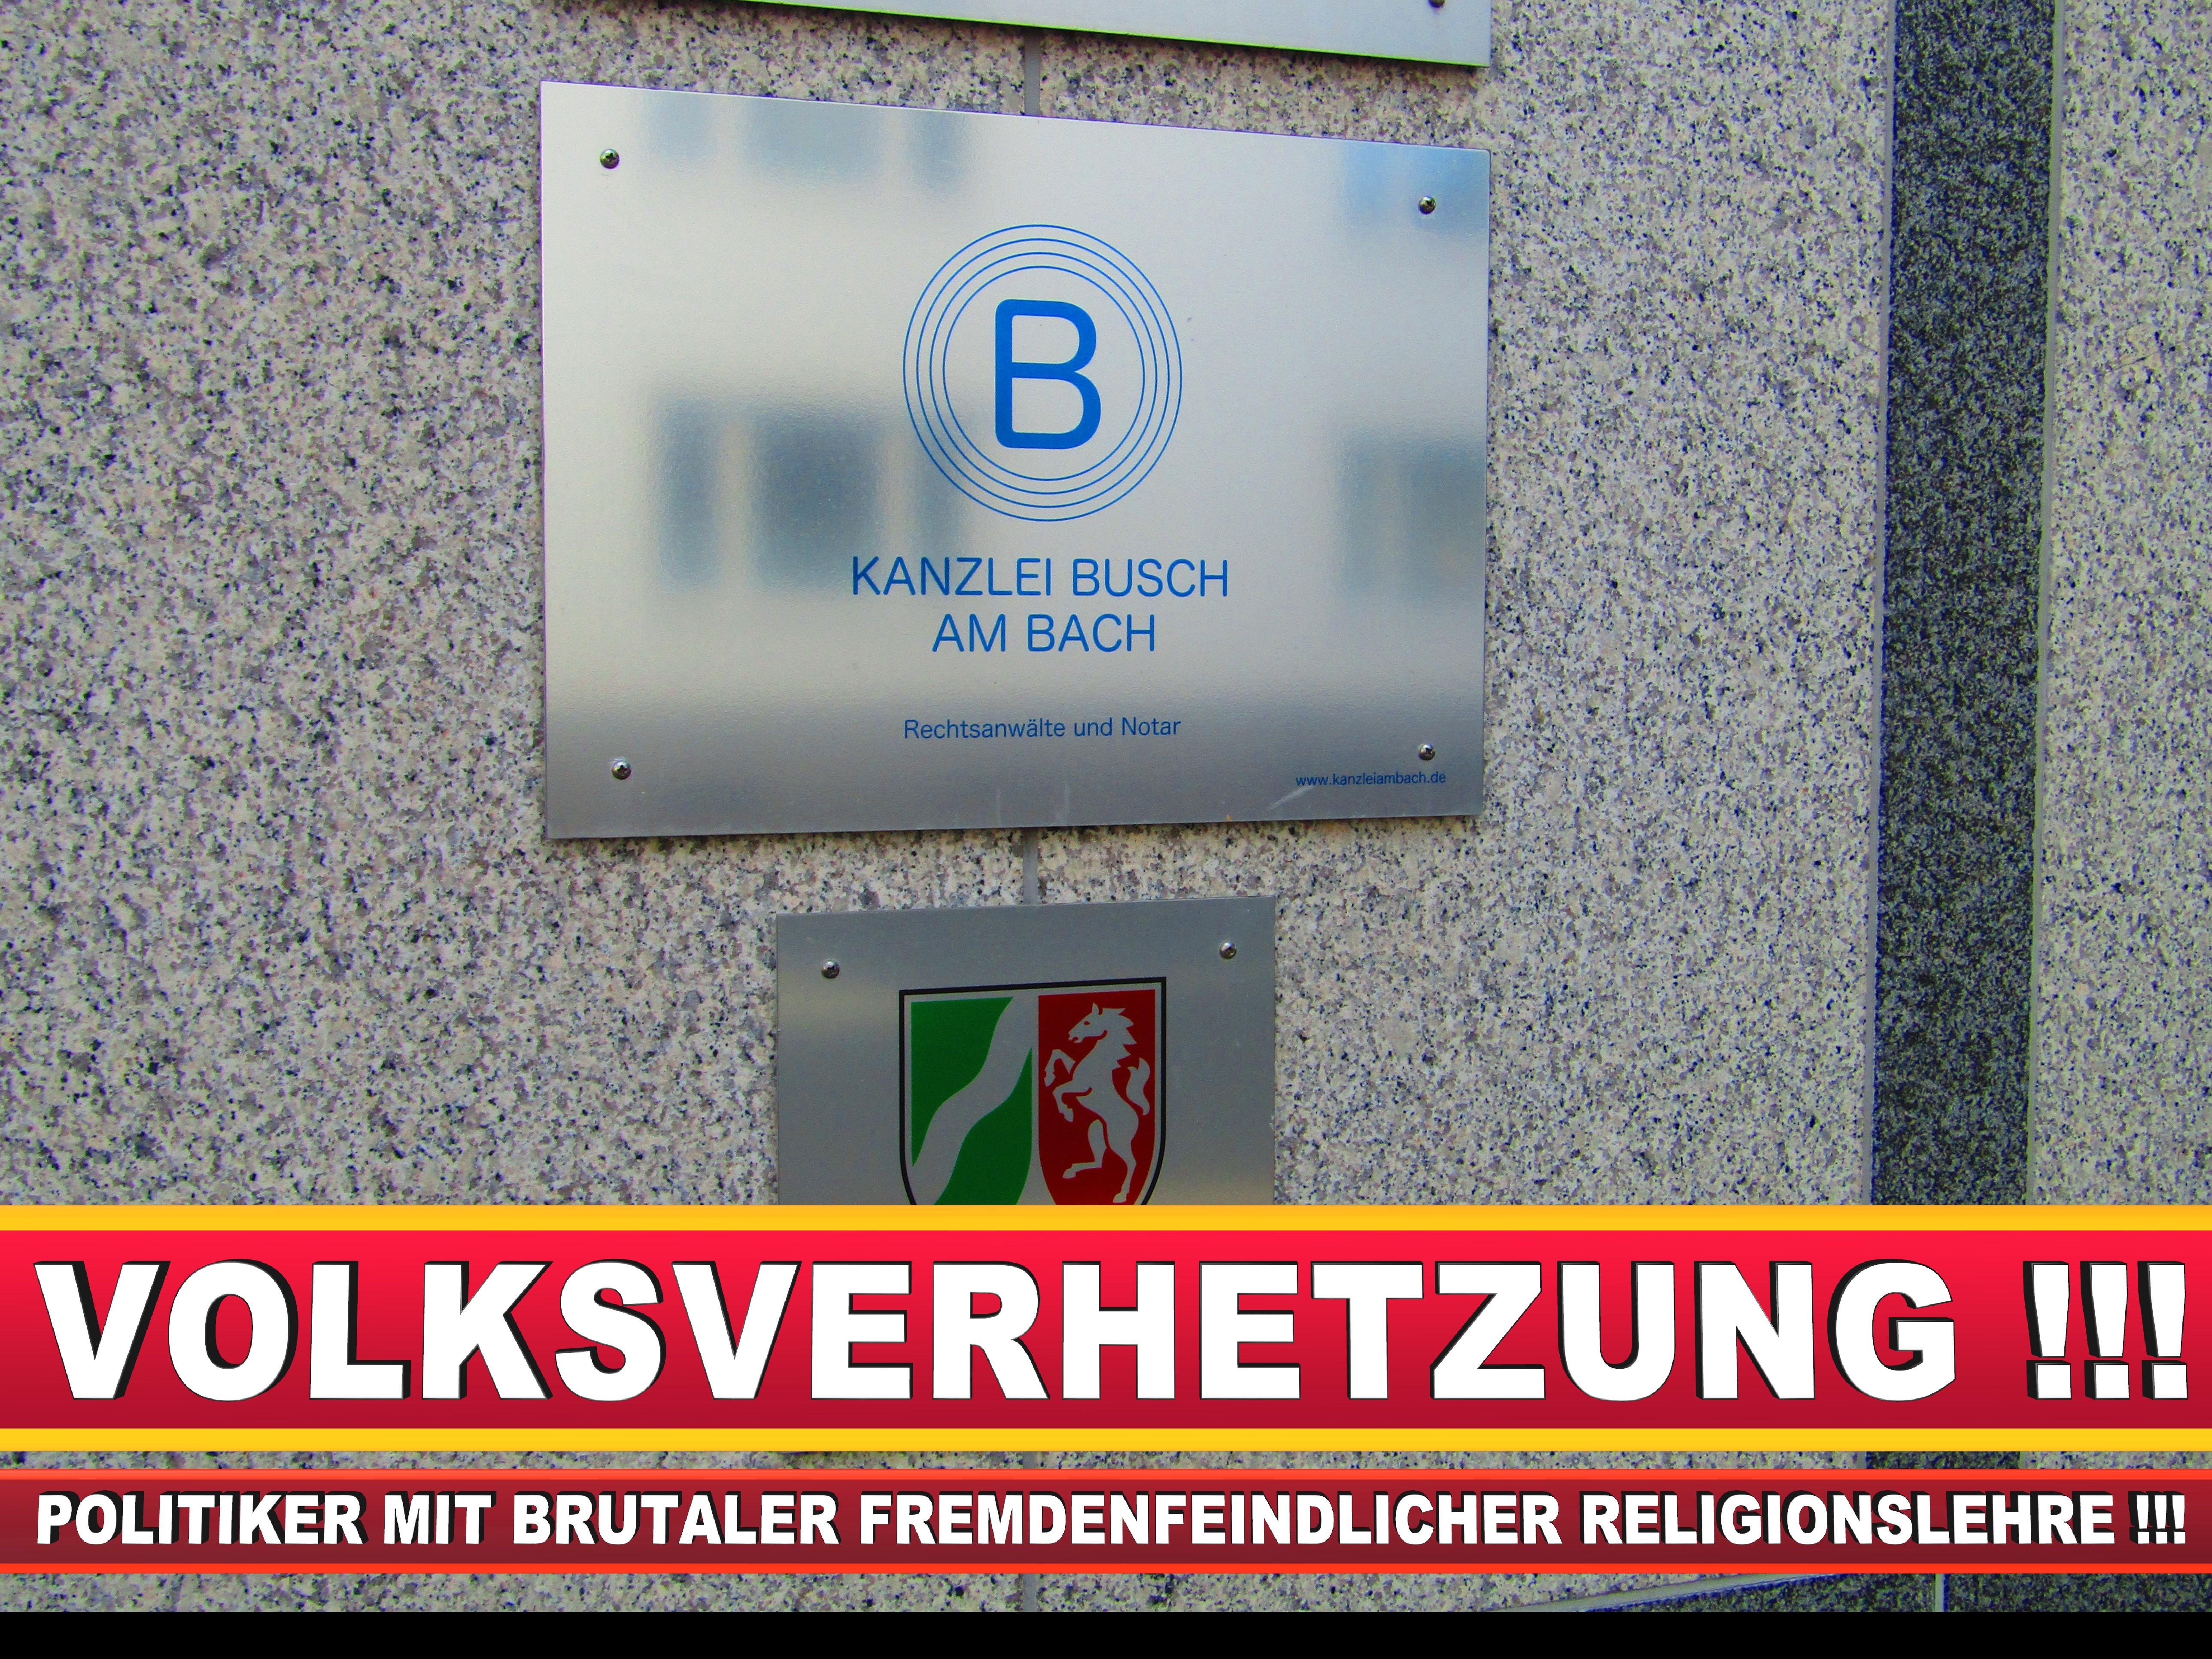 Rechtsanwältin Amelie Busch, Am Bach 2 Bielefeld CDU (5)